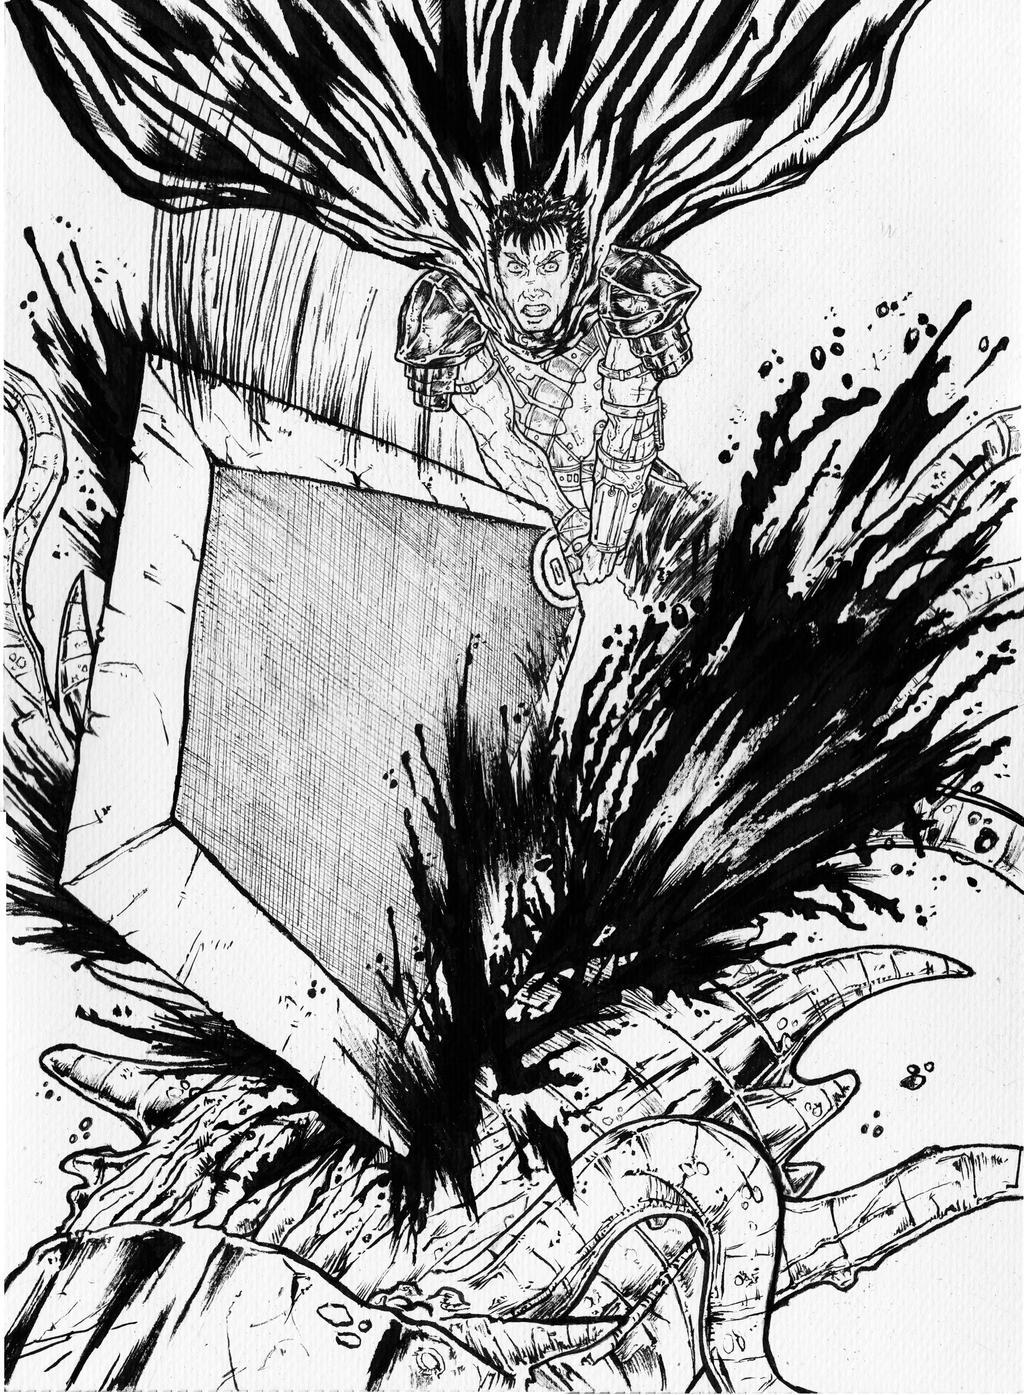 ♕ SPIRIT BRINGERS: EMPYREAN REALM. (SAGA DE UNUKALHAI) Berserk_fan_art___a3_ink_by_igorchakal-d6grh2y